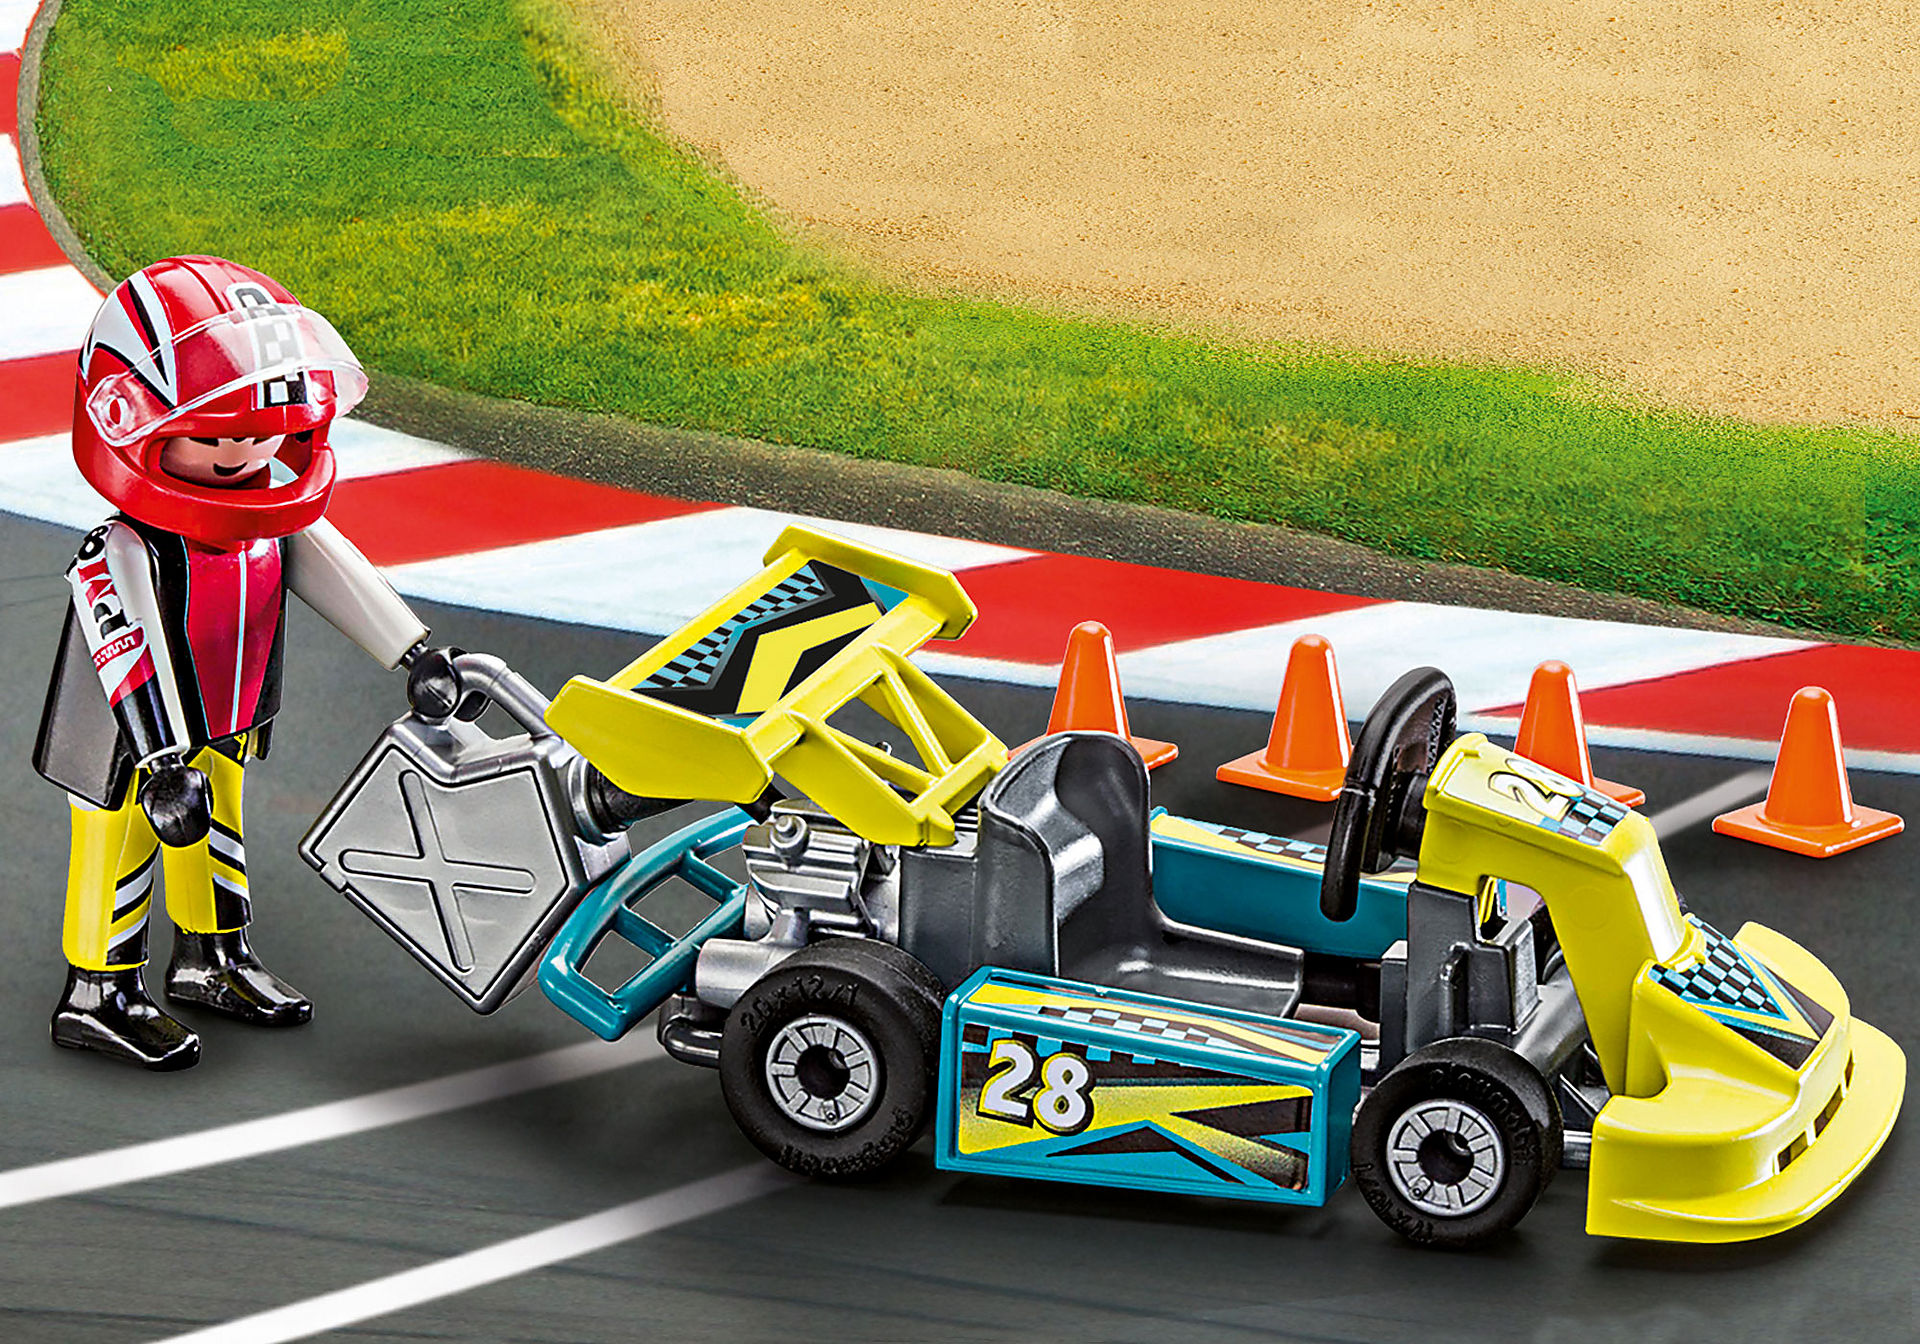 9322 Go-Kart Racer Carry Case zoom image4